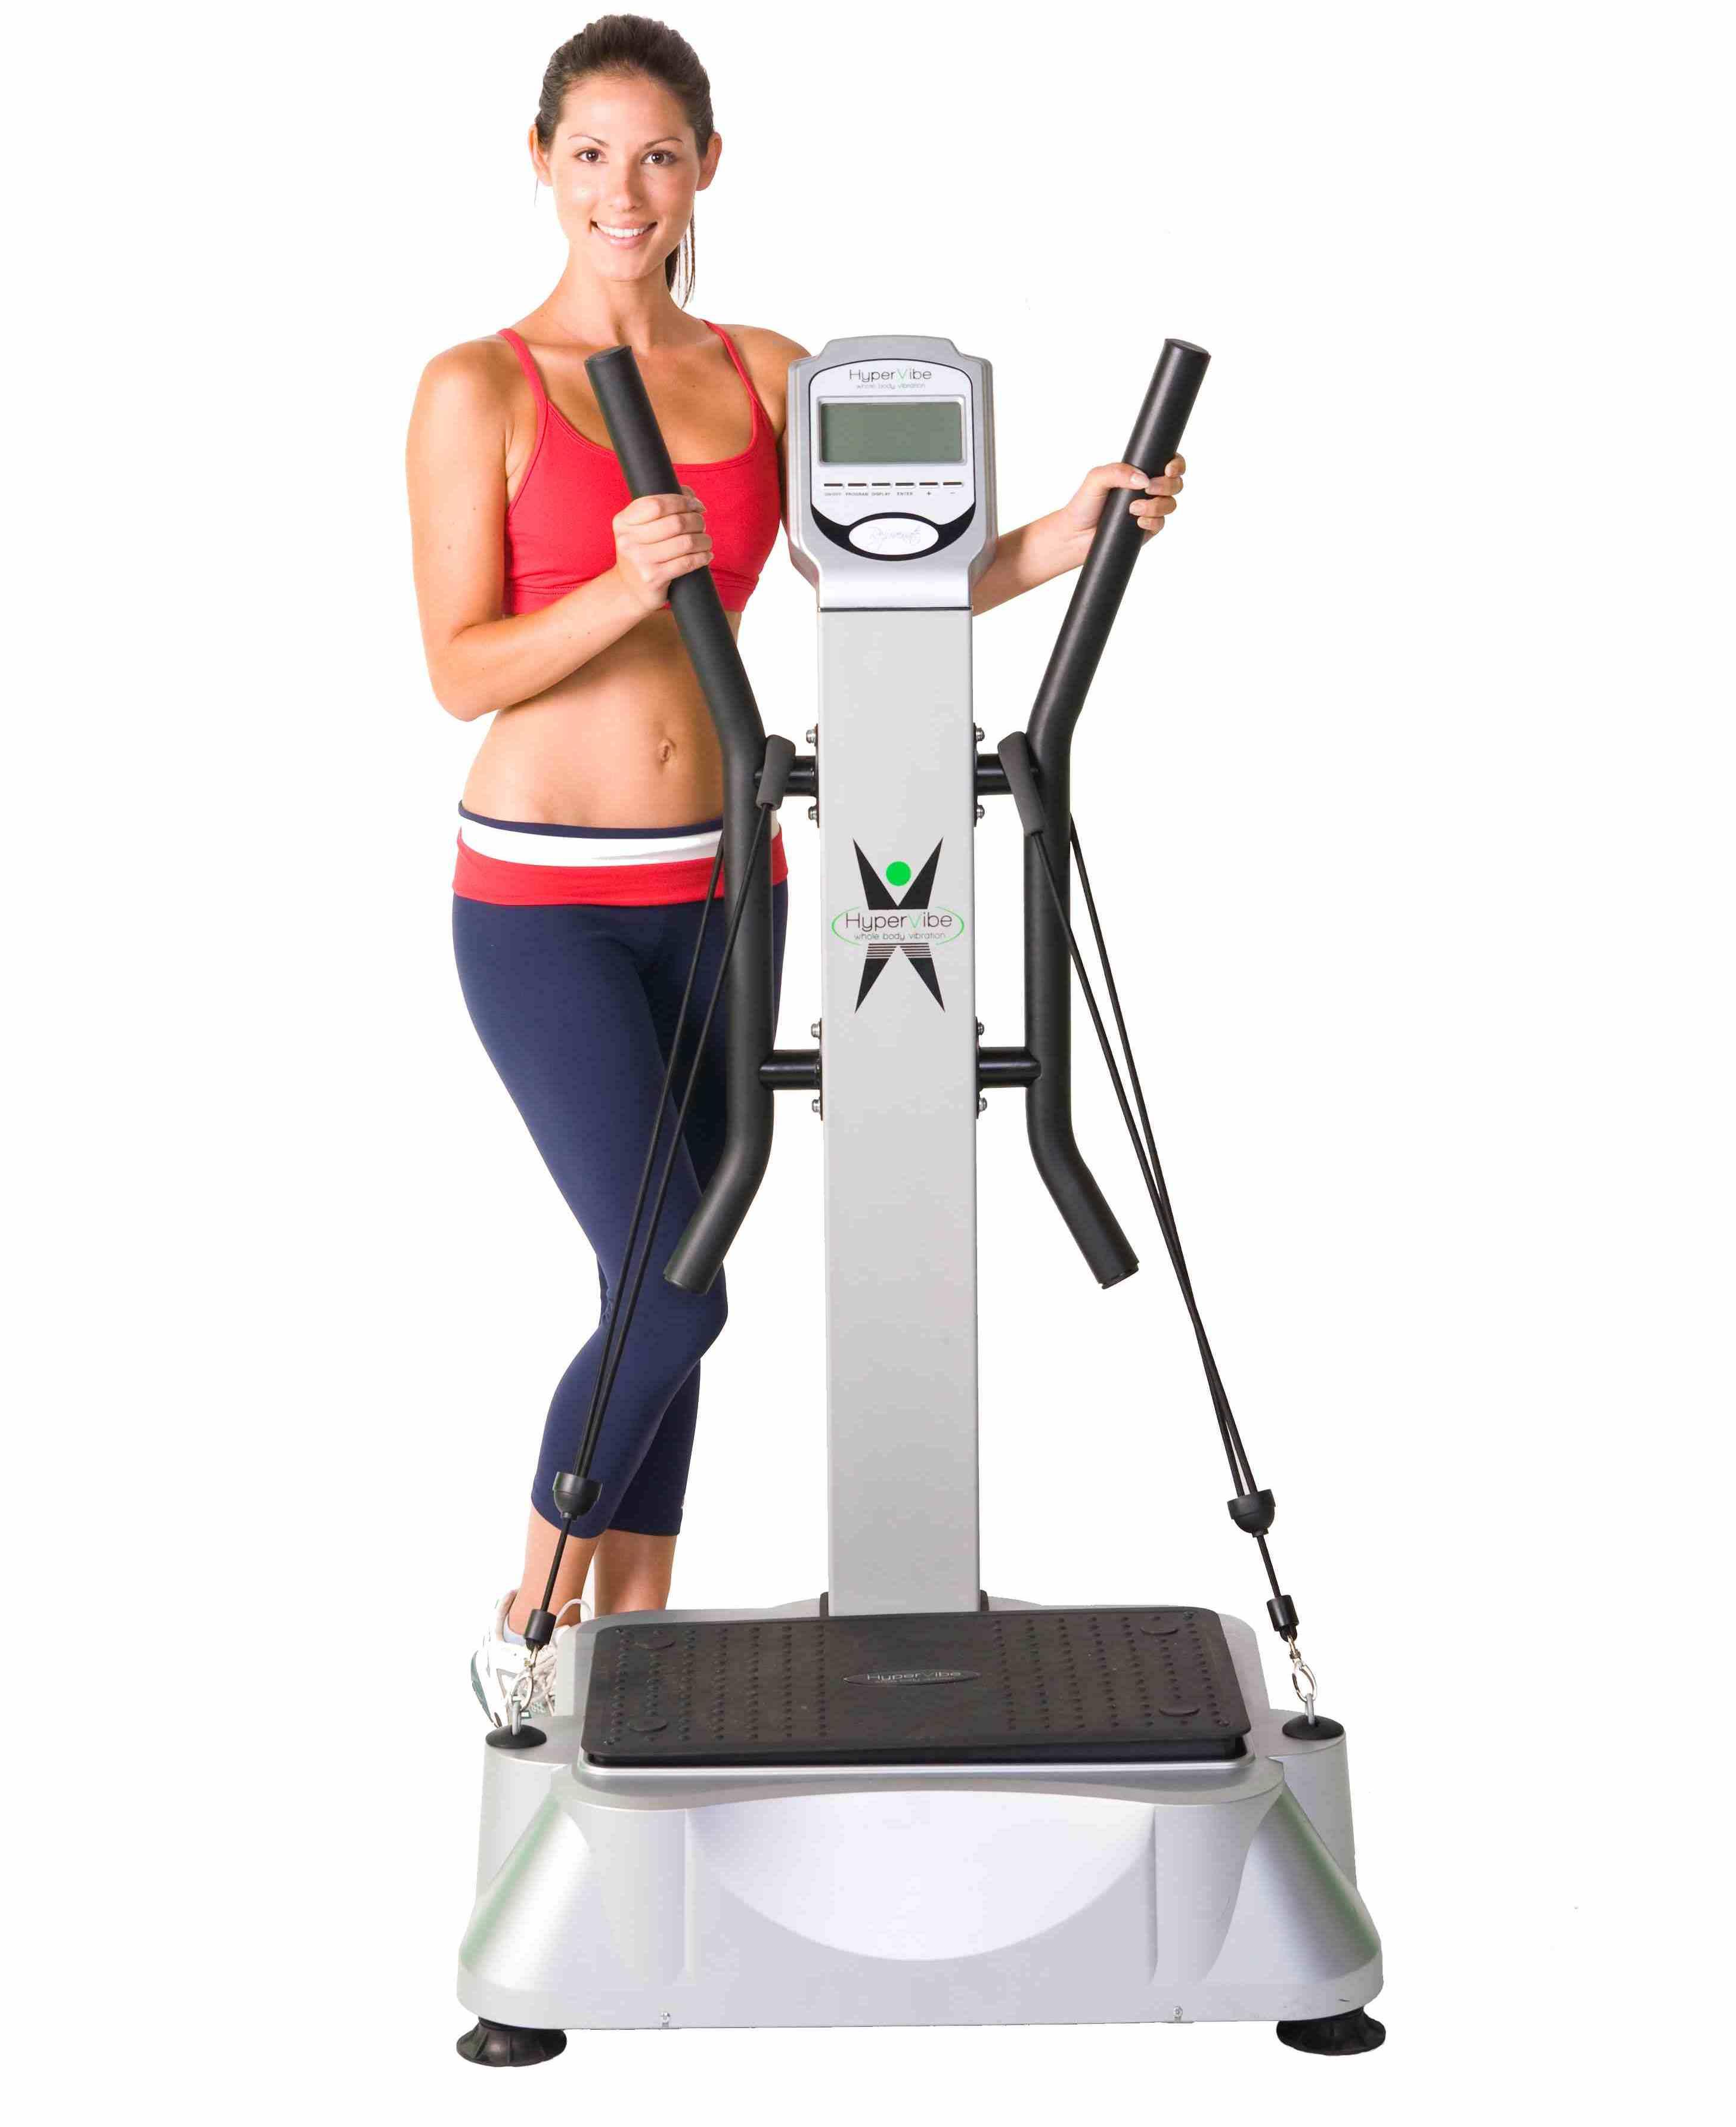 Gimnasia – Fitness – Plataformas vibratorias para adultos